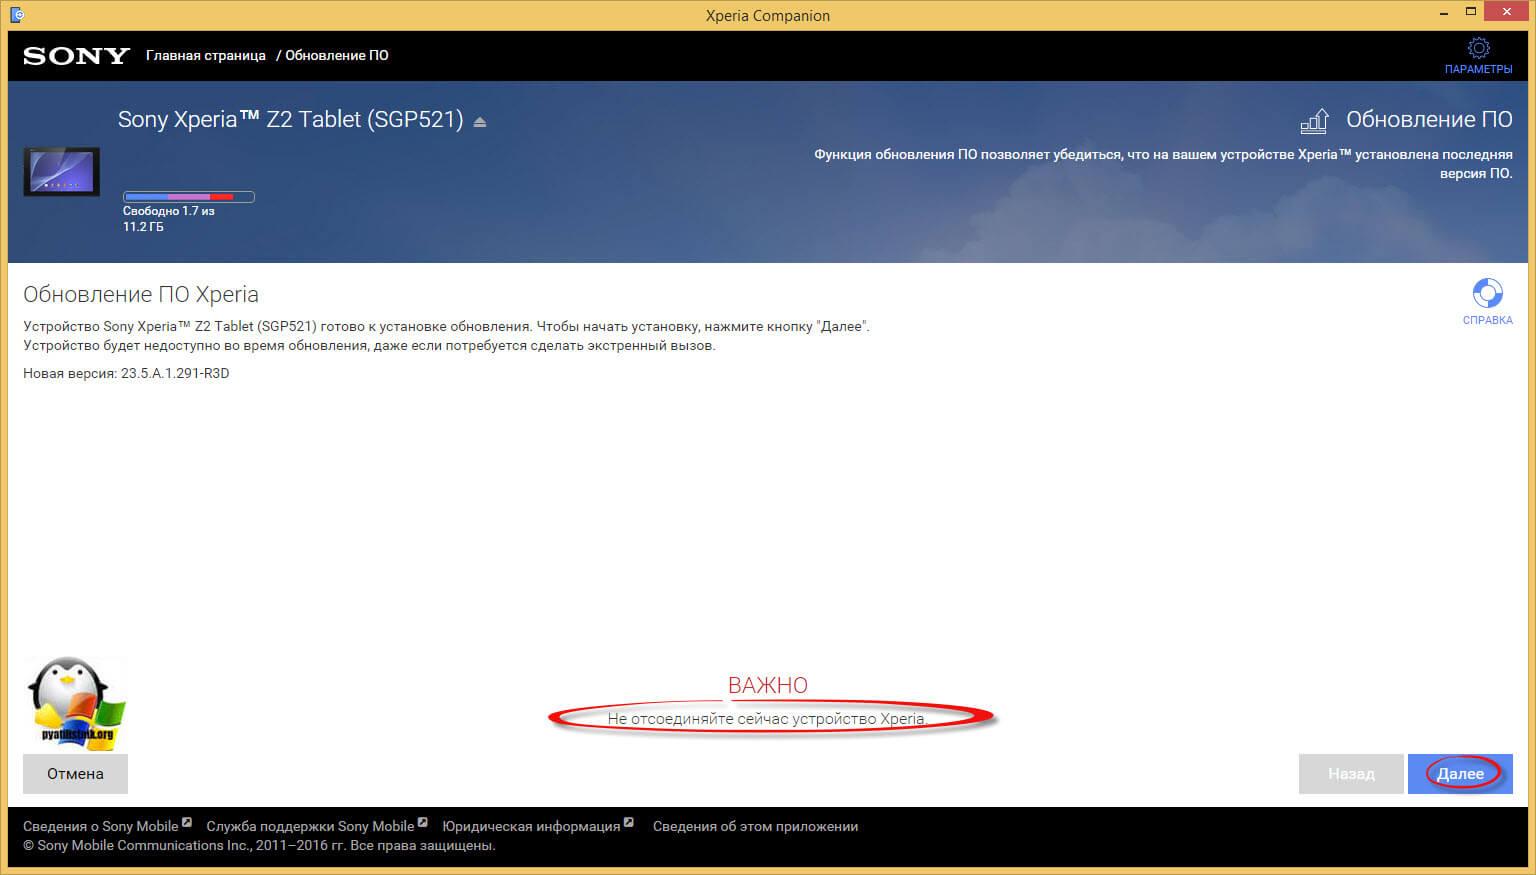 Драйвер для sony xperia z2 к компьютеру по usb